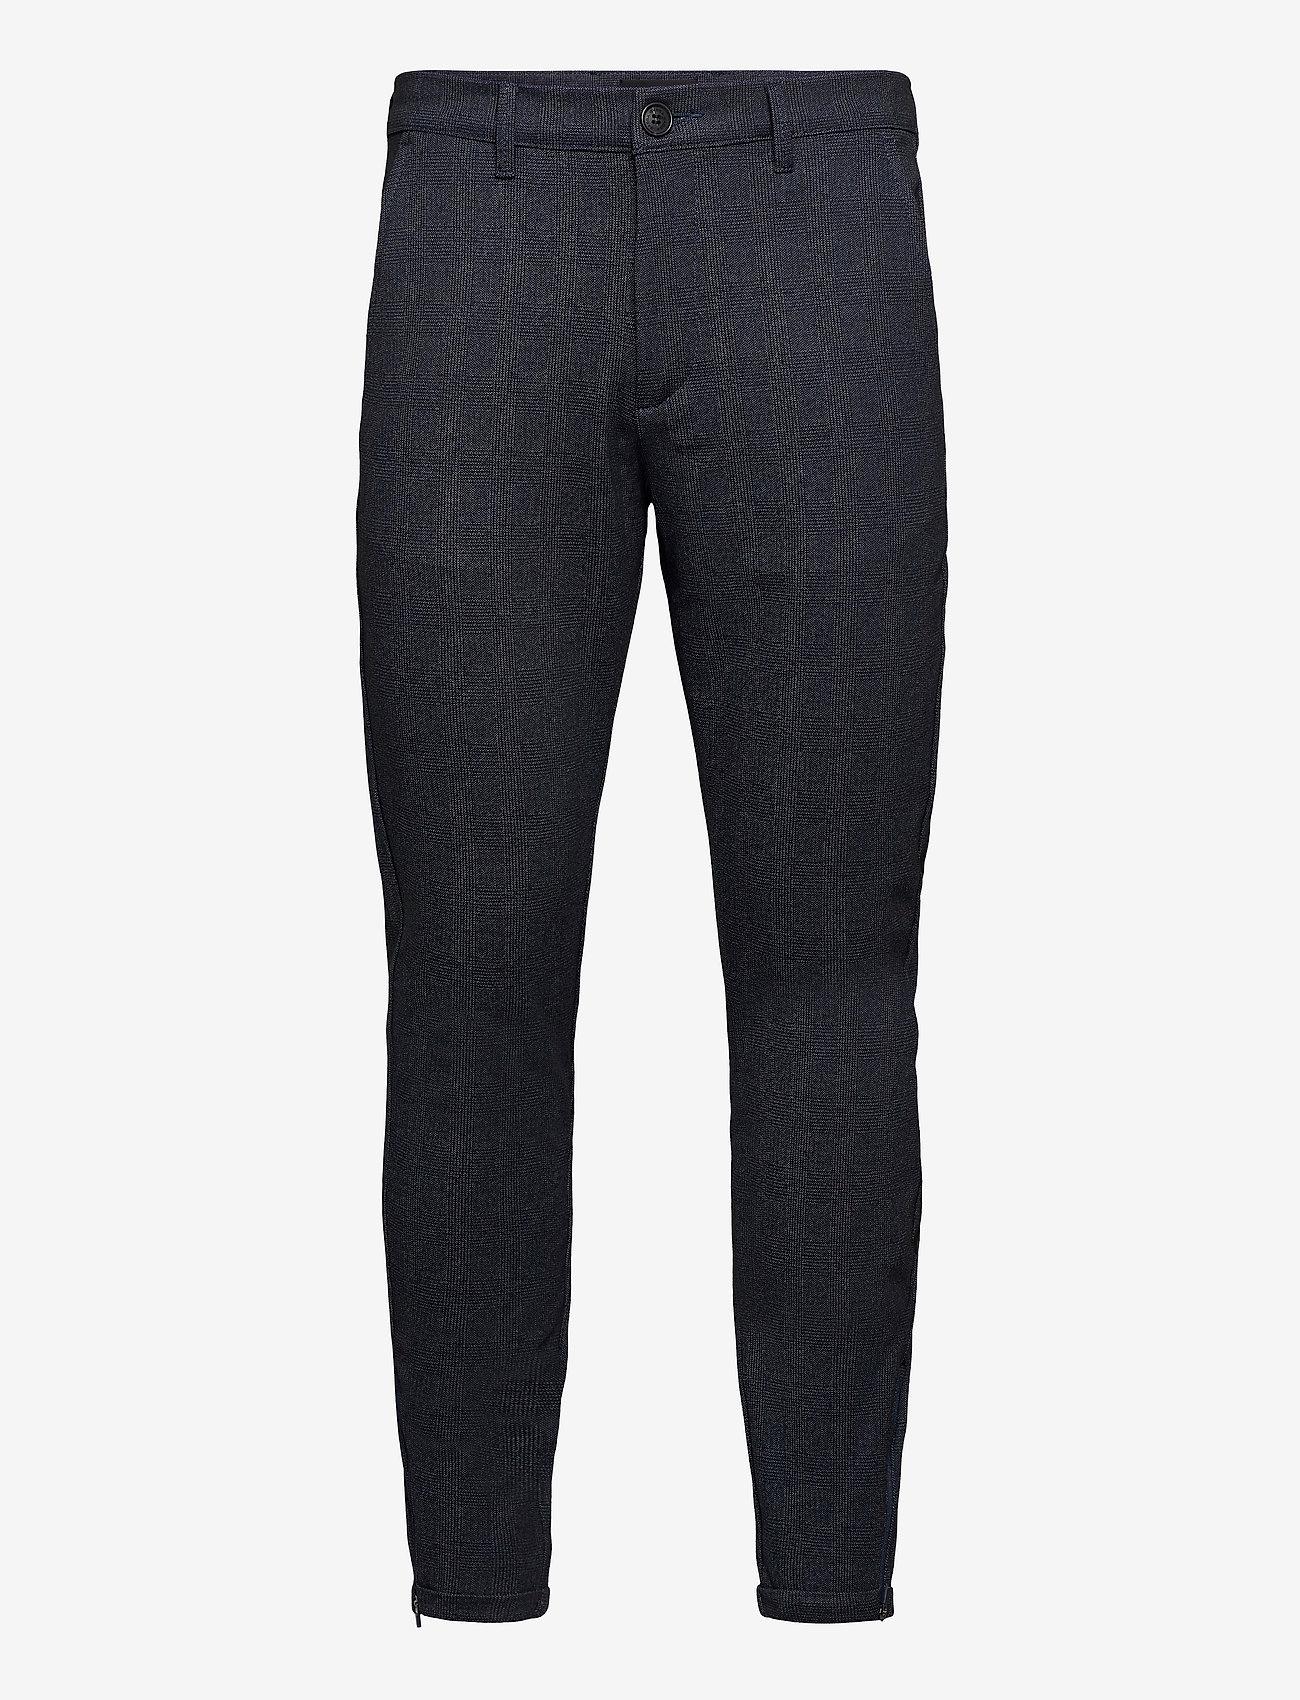 Gabba - Pisa KD3920 Quad Pant - casual - blue check - 0